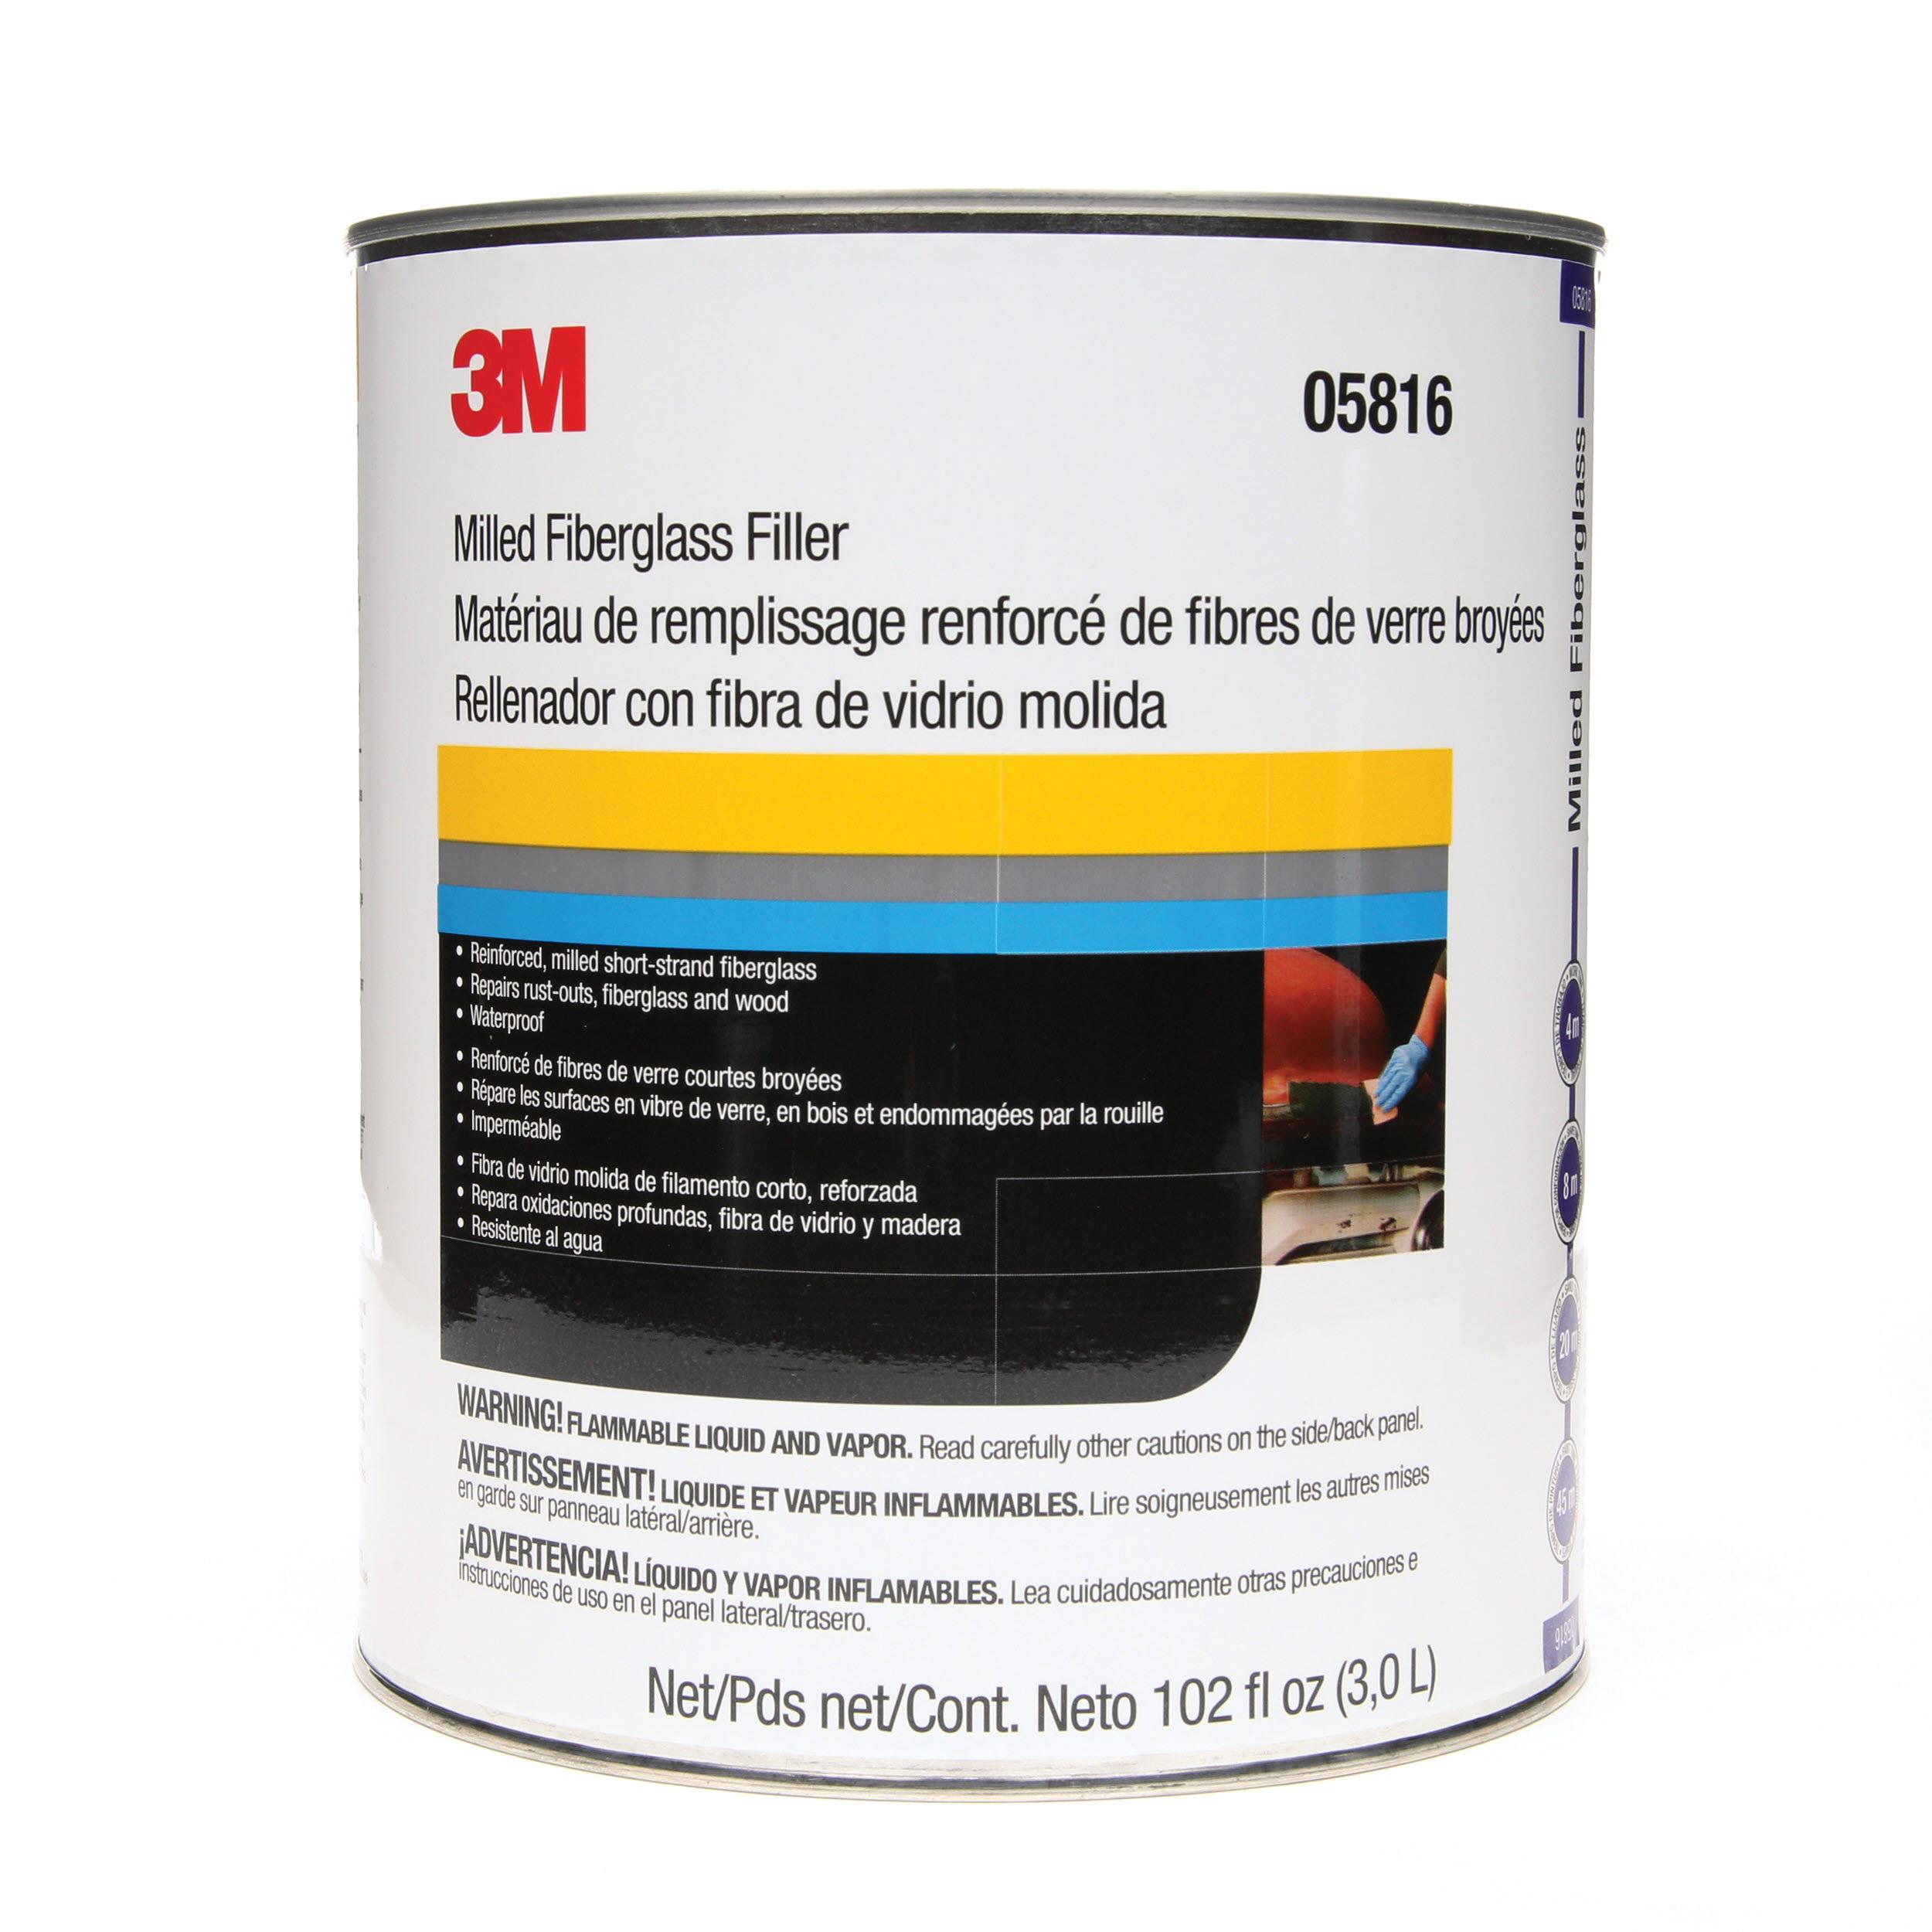 3M™ Marson® 051131-05816 Mar-Glass® 2-Component 2-Part Short Strand Fiberglass Reinforced Filler, 1 gal Container, Part A: Viscous/Part B: Paste Form, Part A: Green/Part B: Red